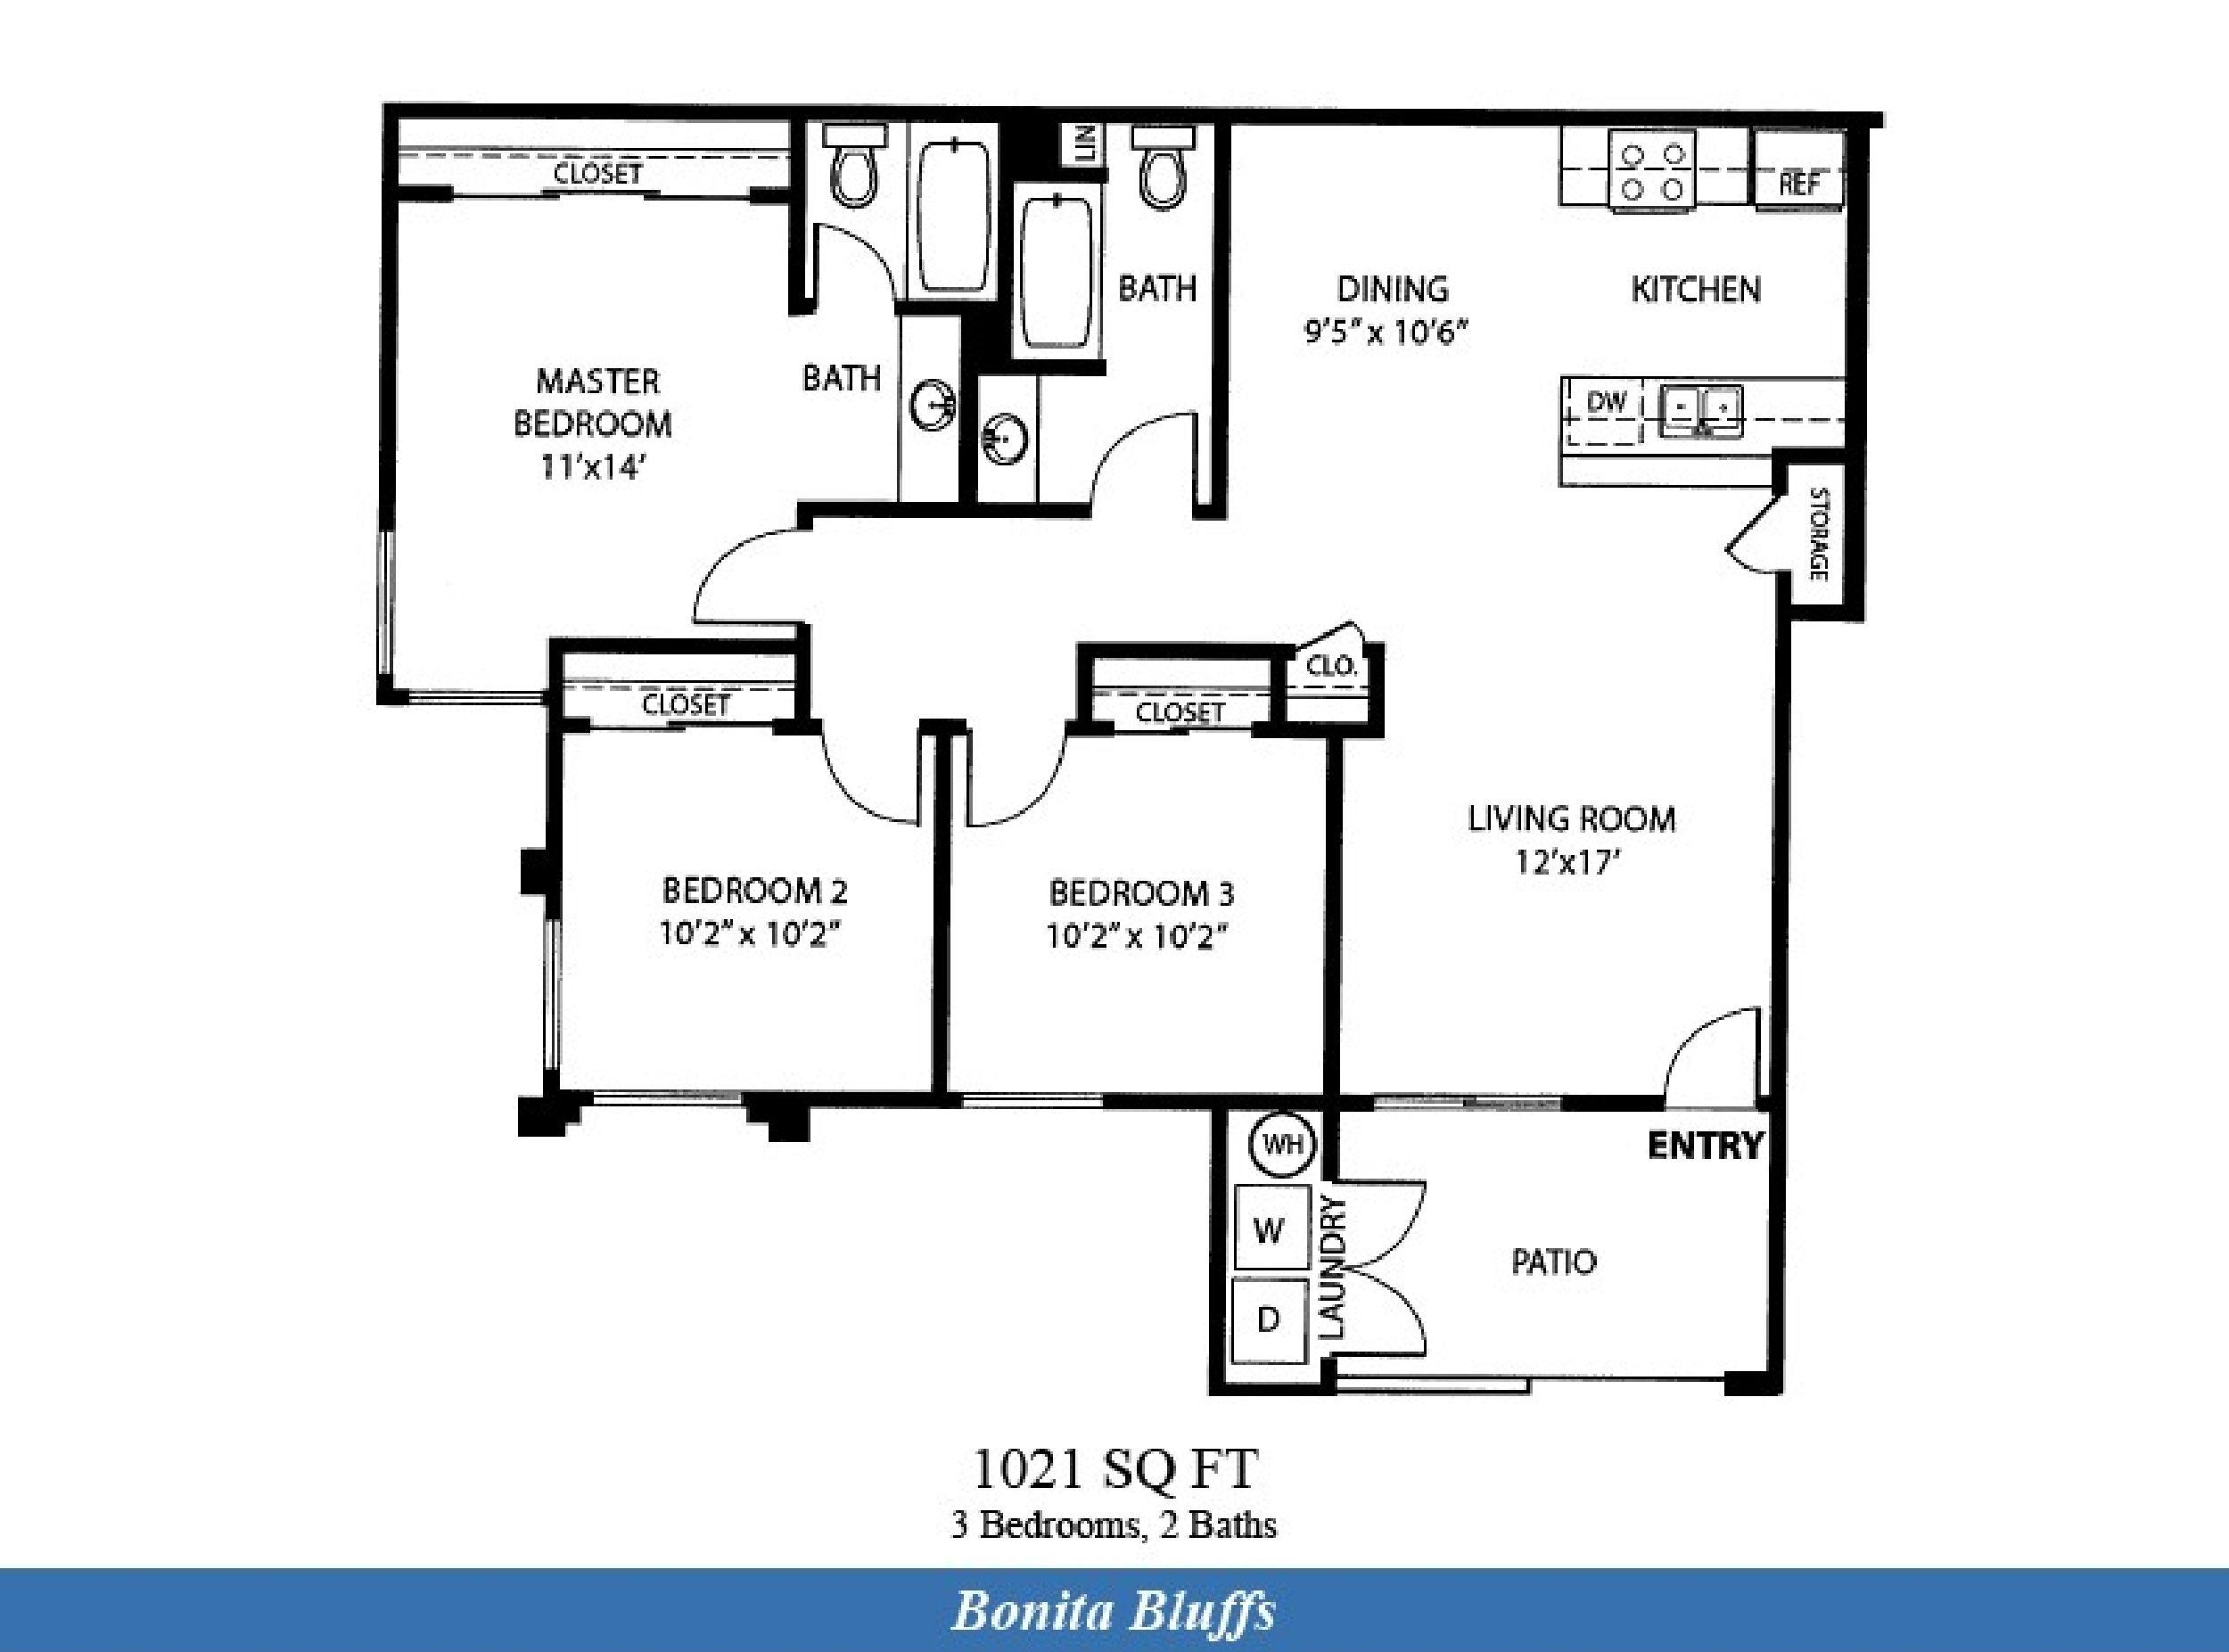 Naval Complex San Diego Bonita Bluffs Neighborhood 3 Bedroom 2 Bath Apartment Floor P Military Housing Lincoln Military Housing San Diego Naval Base Housing